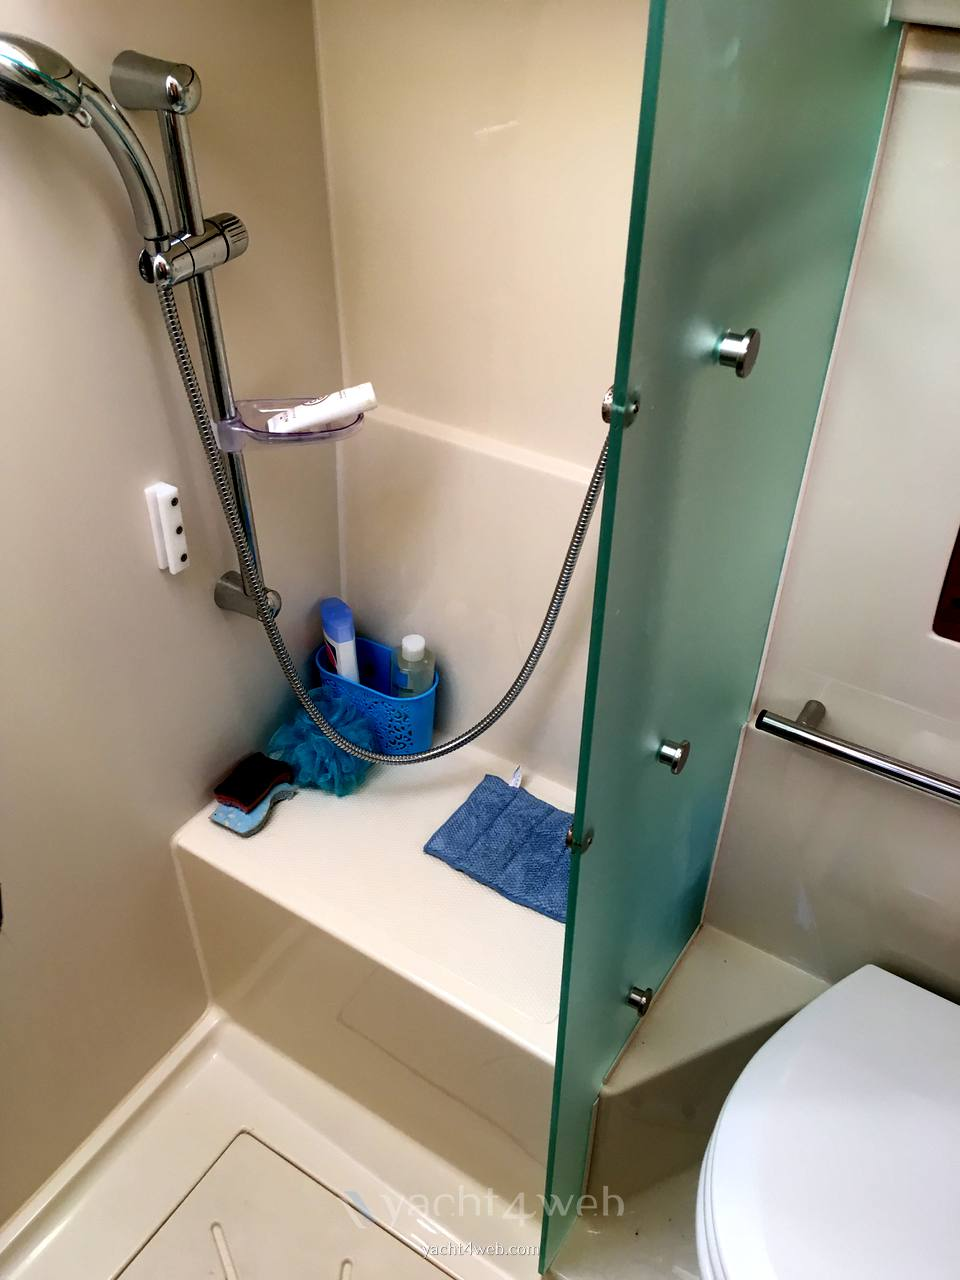 Elan Impression 434 - Photo Hygienic service 1